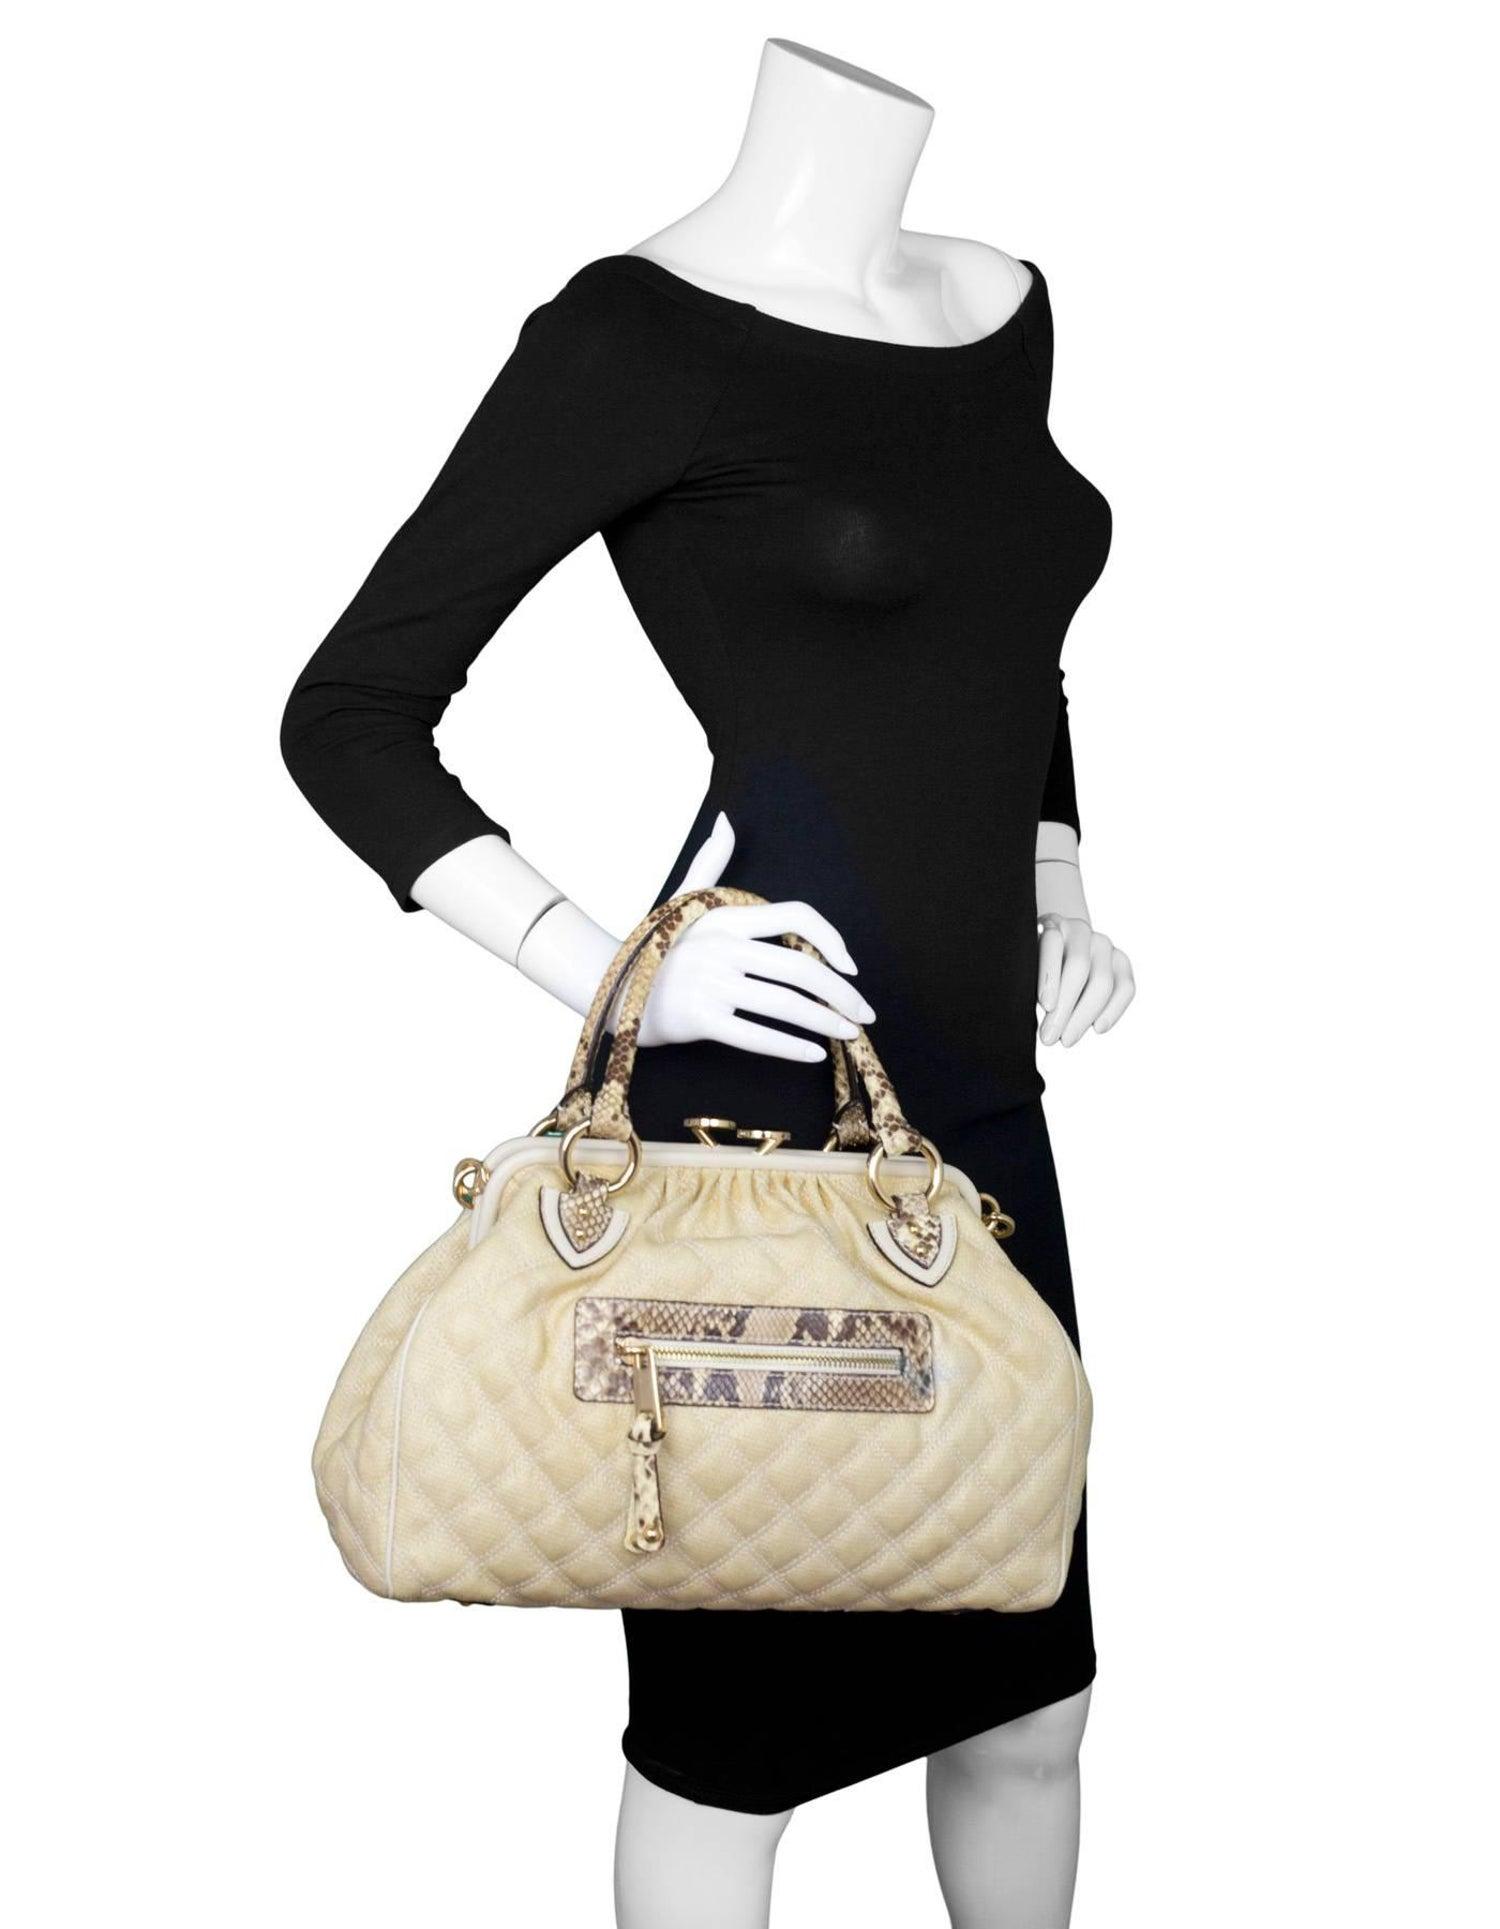 72f0c9e62c87 Marc Jacobs Cream Raffia and Python Stam Bag For Sale at 1stdibs